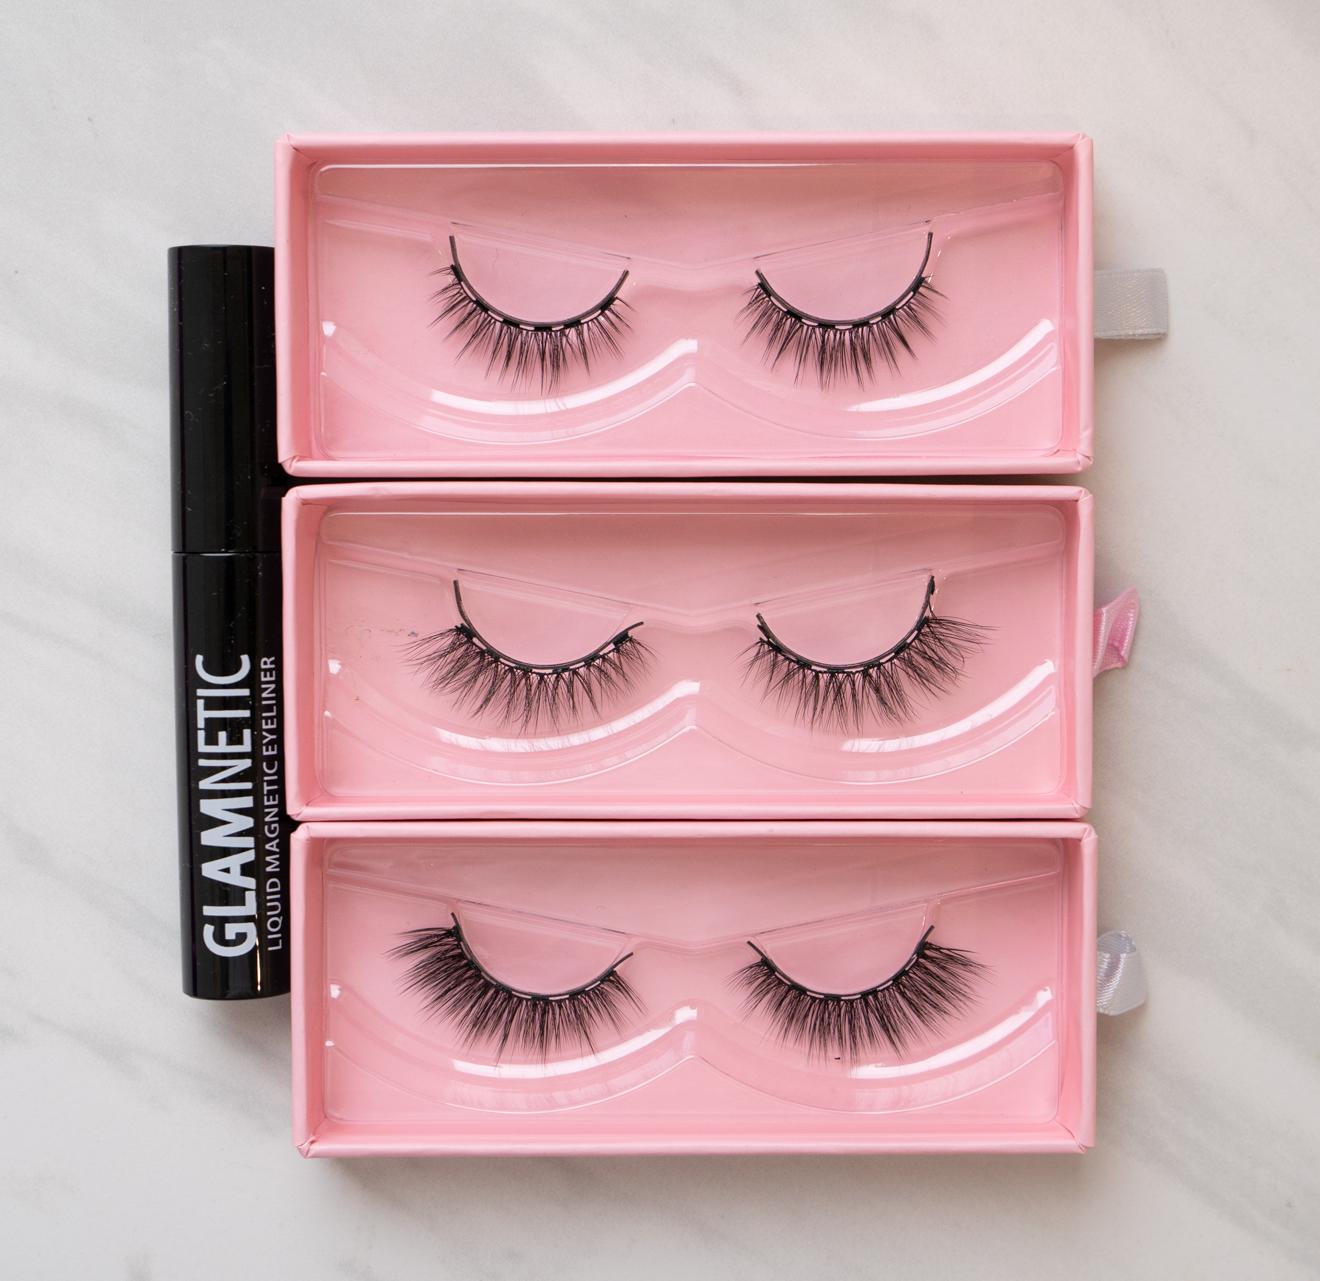 glamnetic magnetic eyelash styles